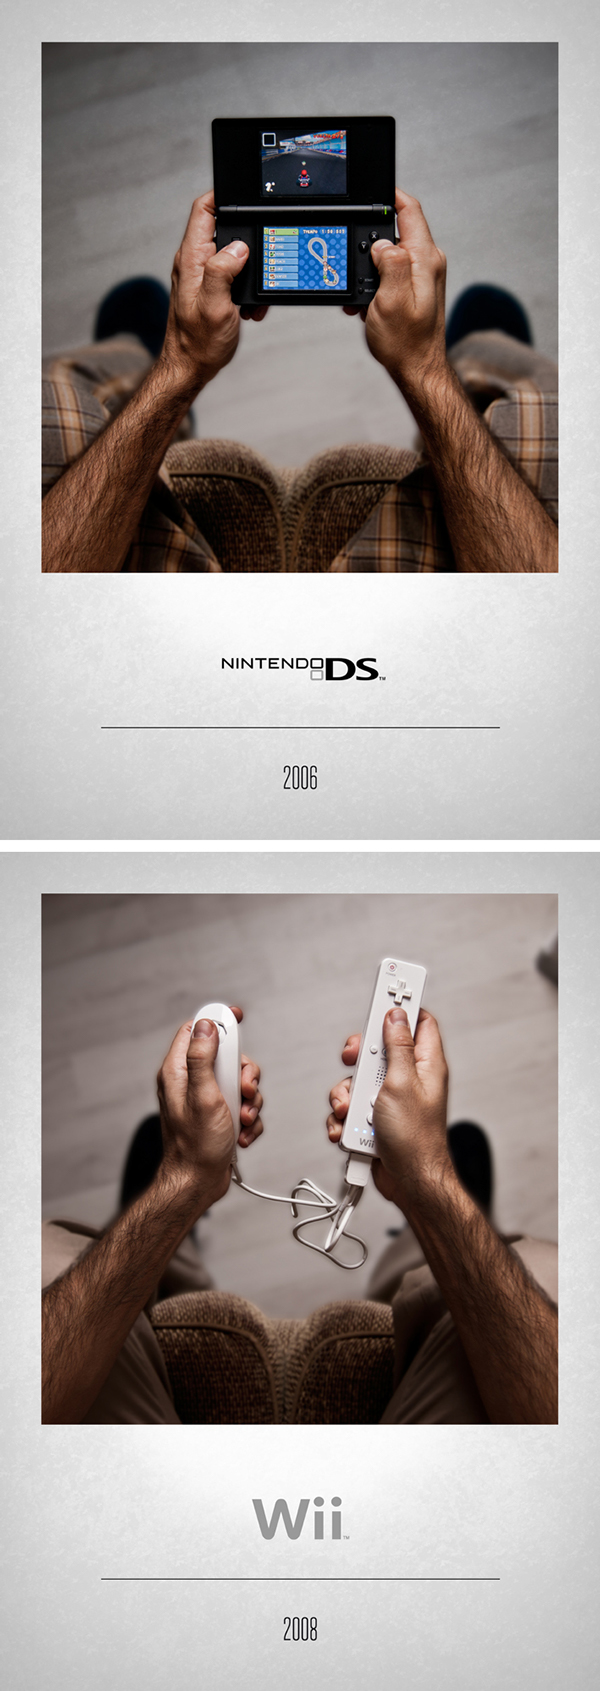 Nintendo DS controller